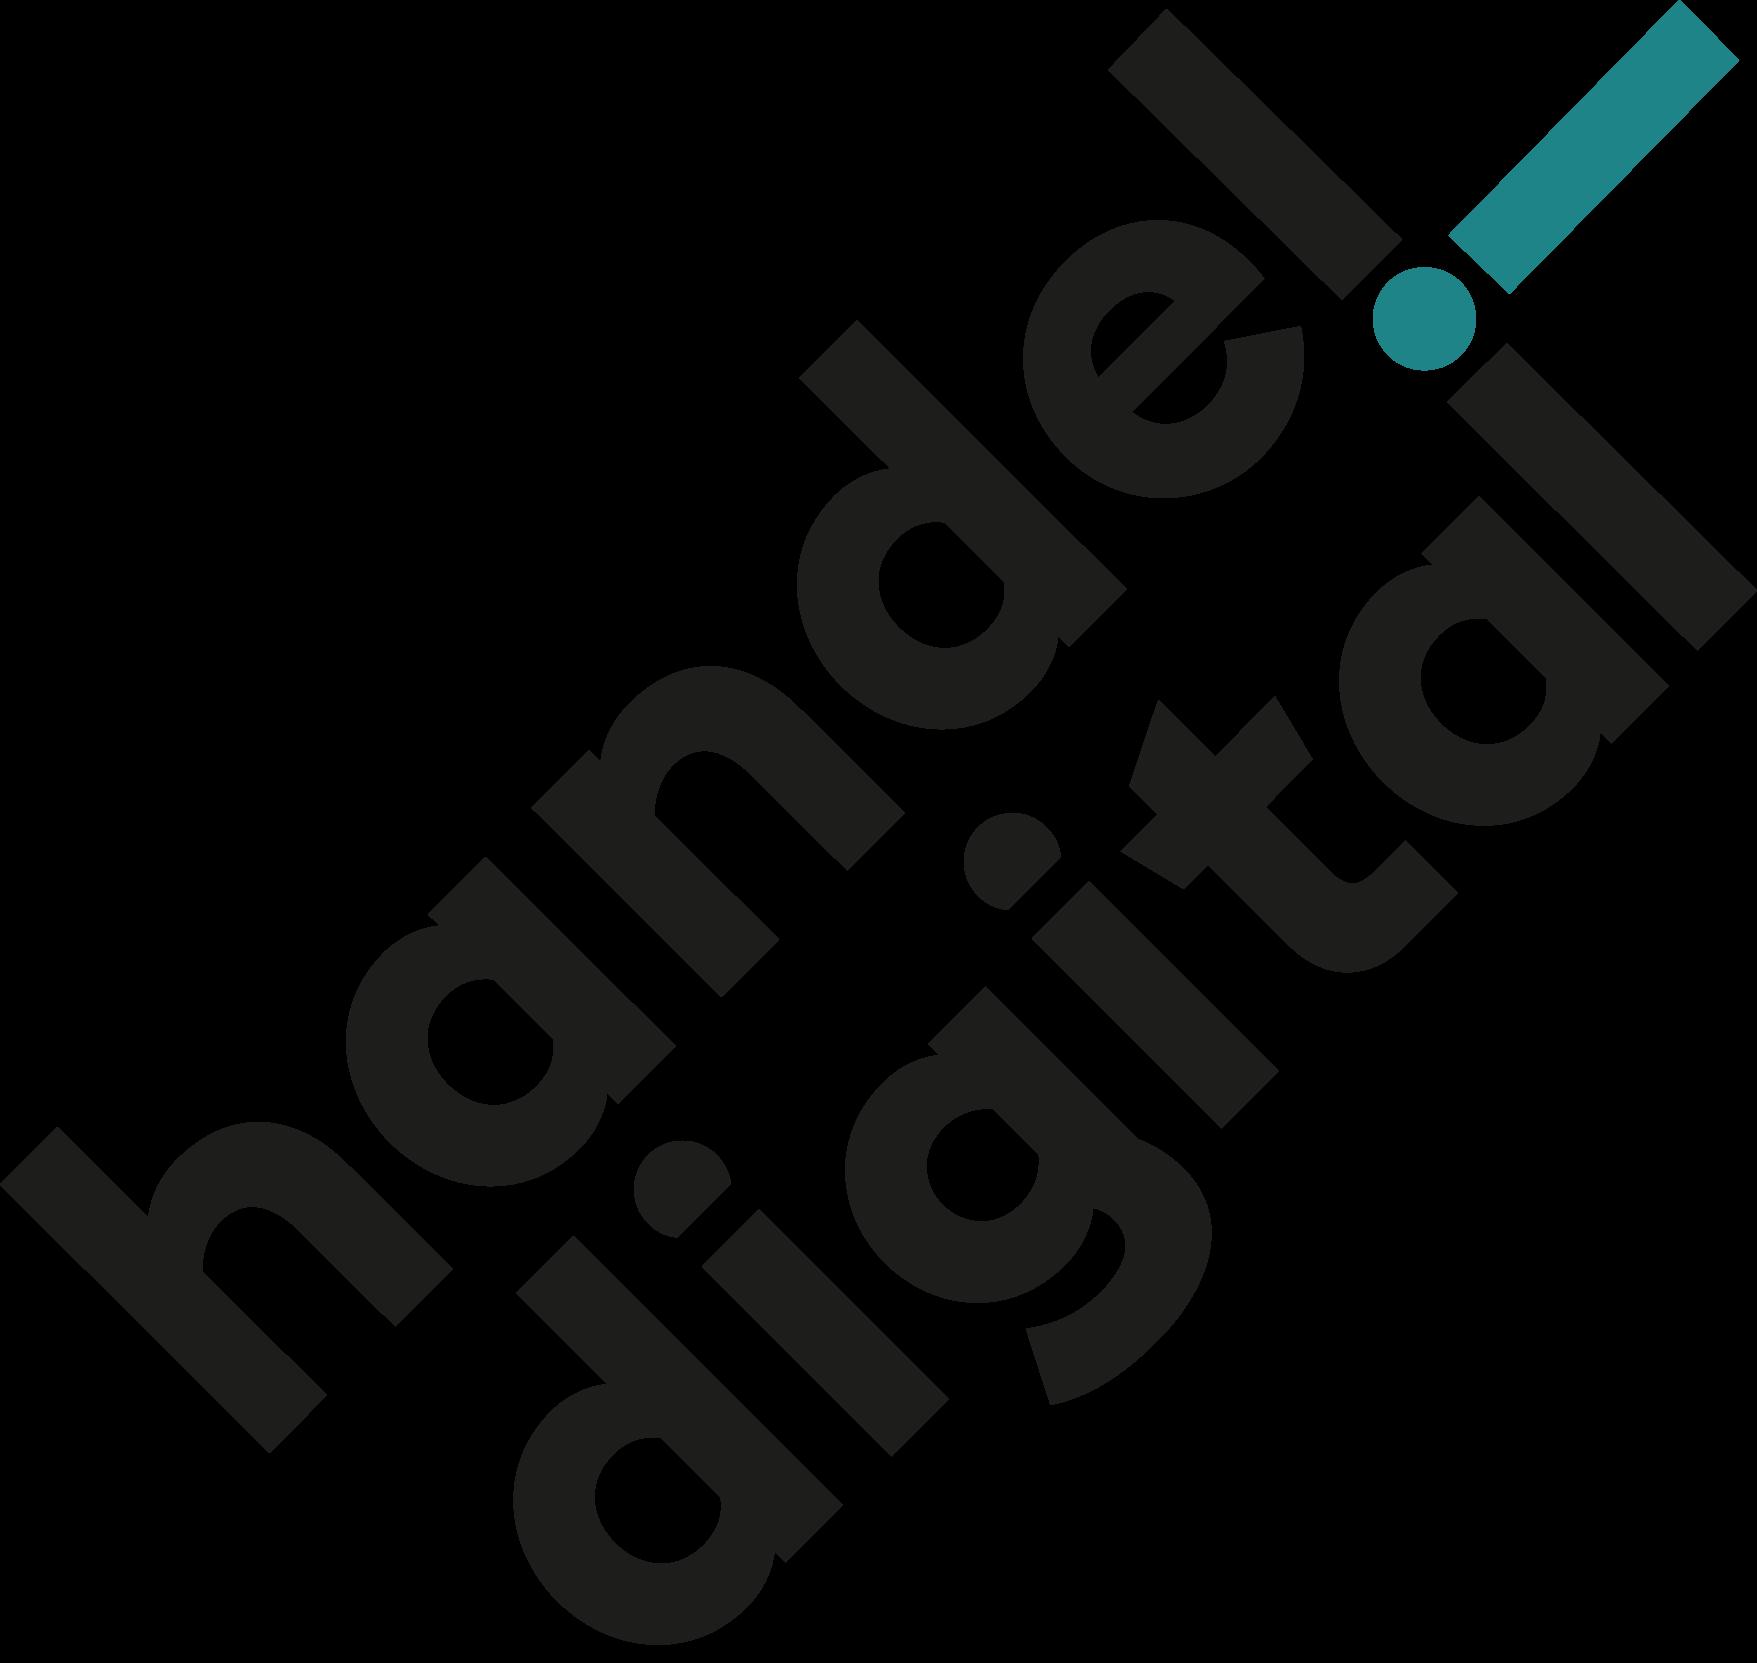 Handel Digital 4. Digi-Level der Digitalisierung